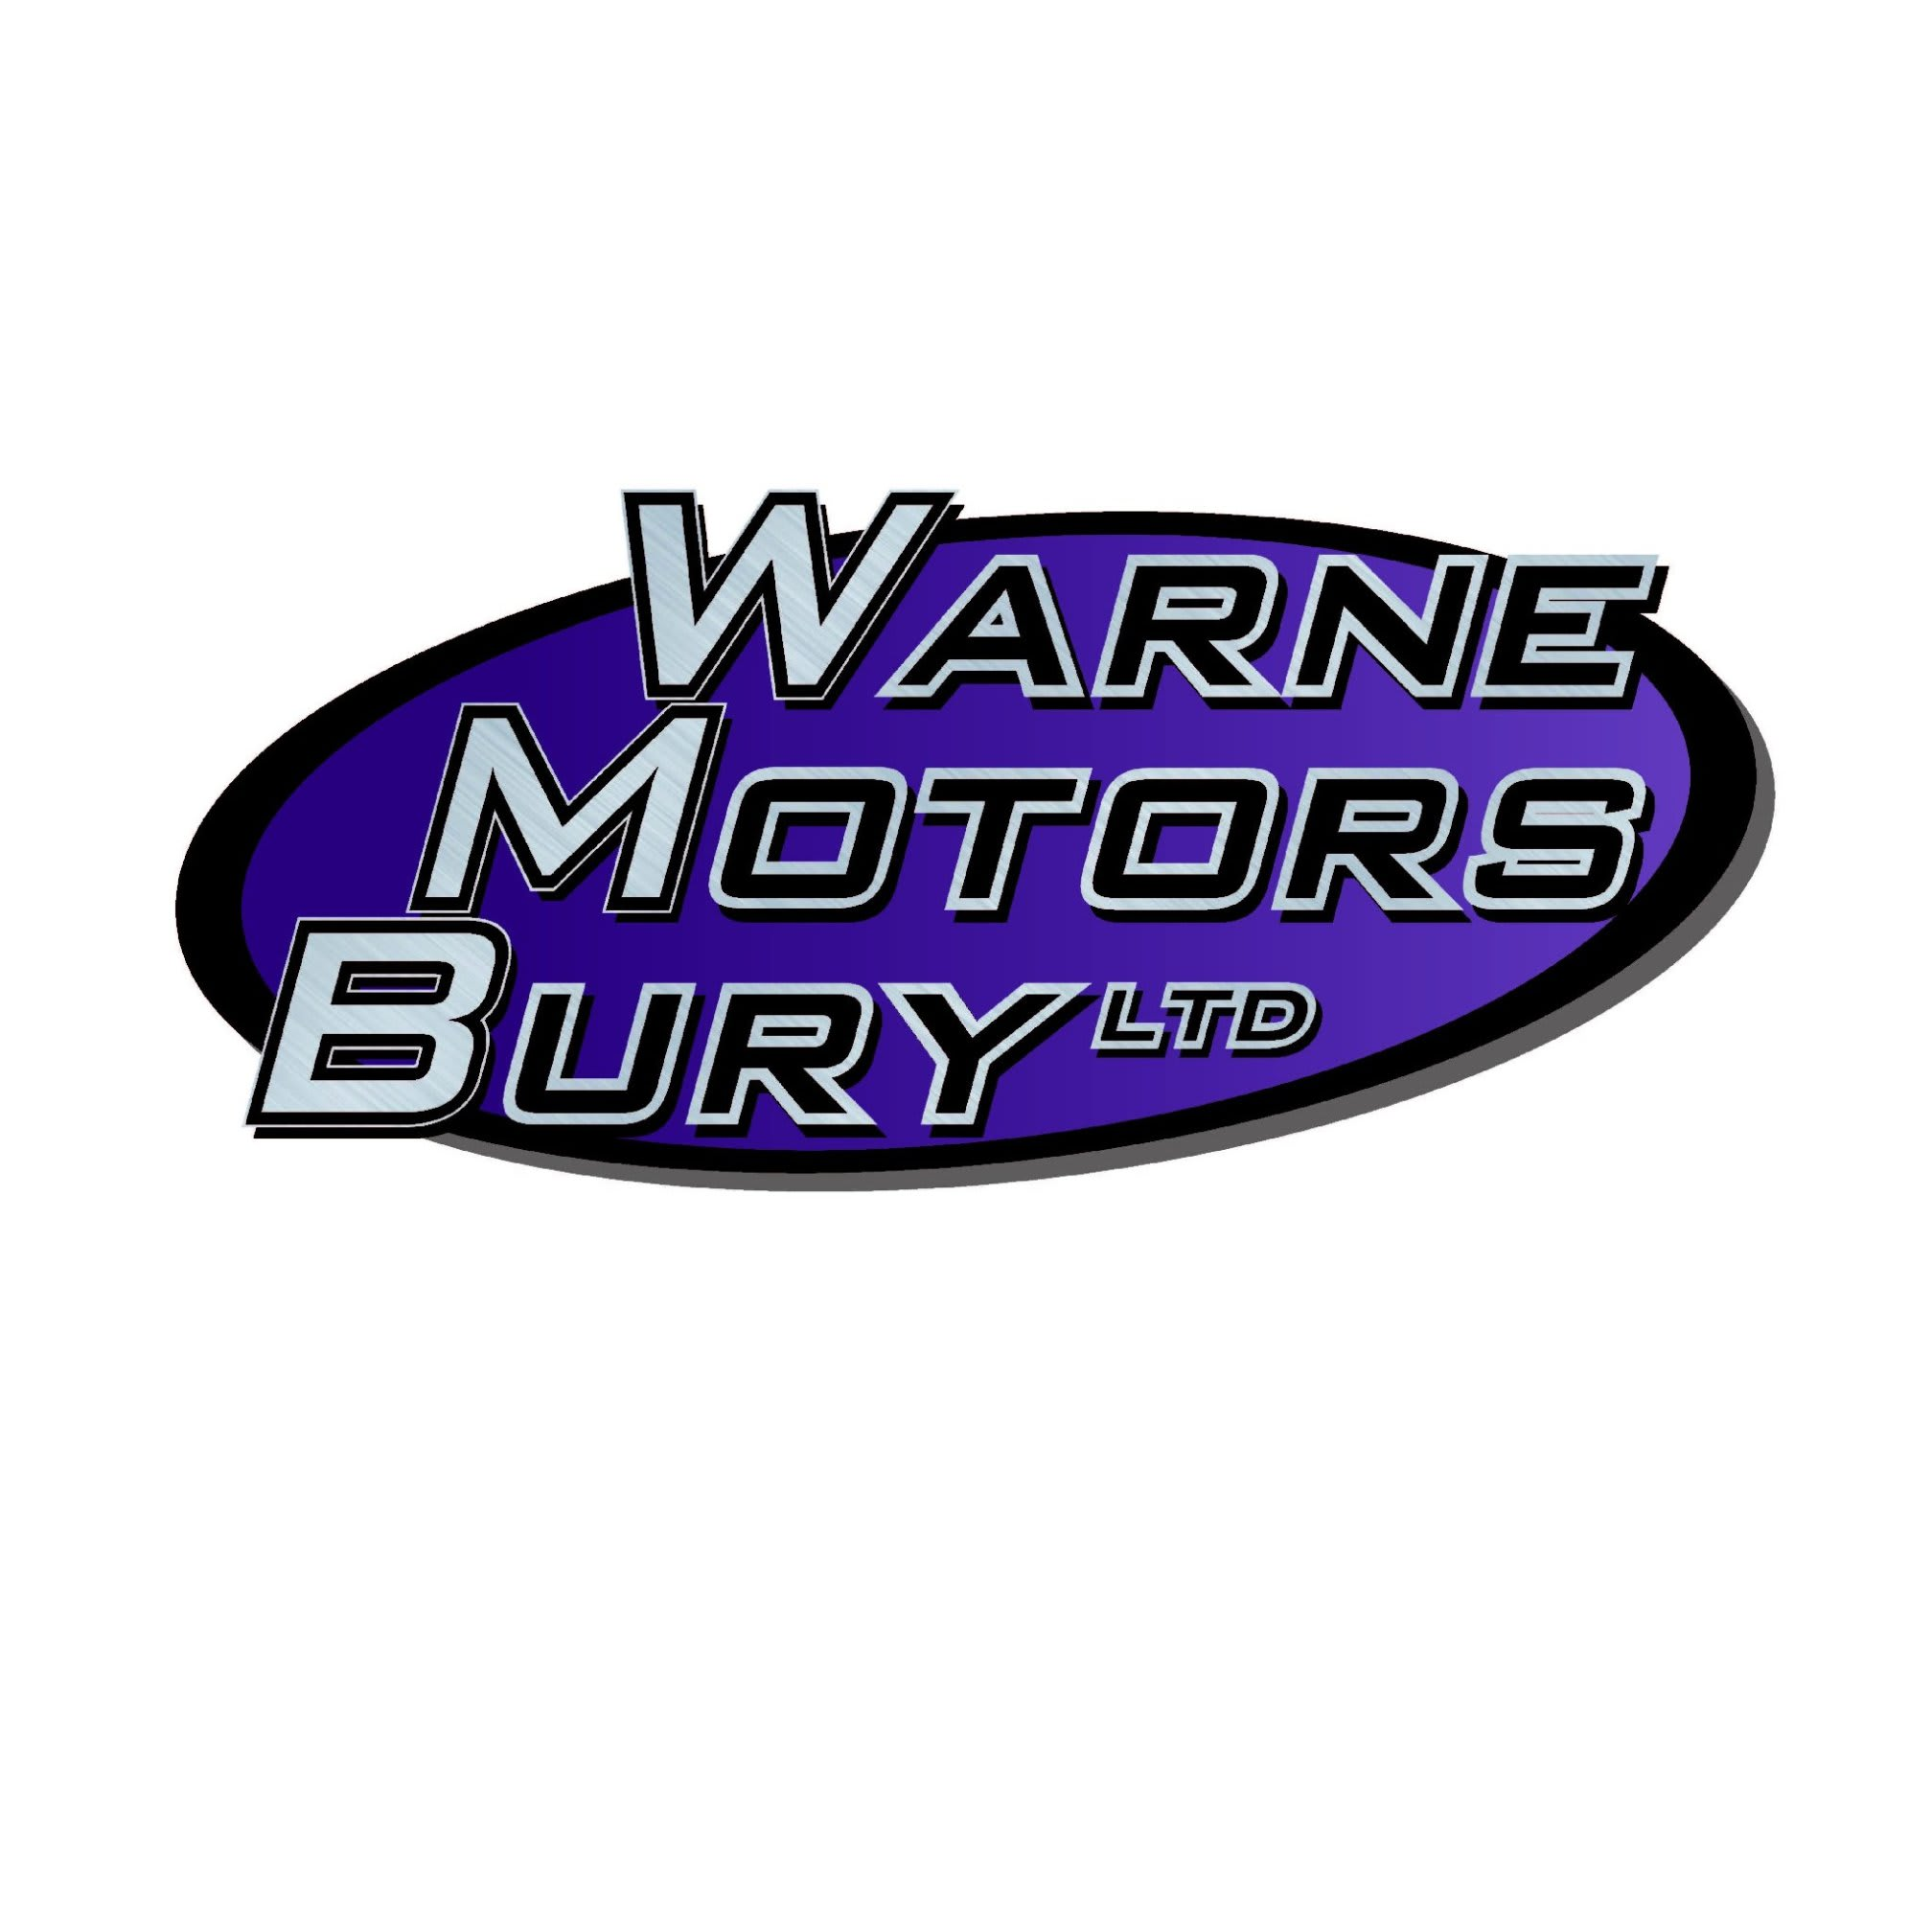 Warne Motors Bury Ltd